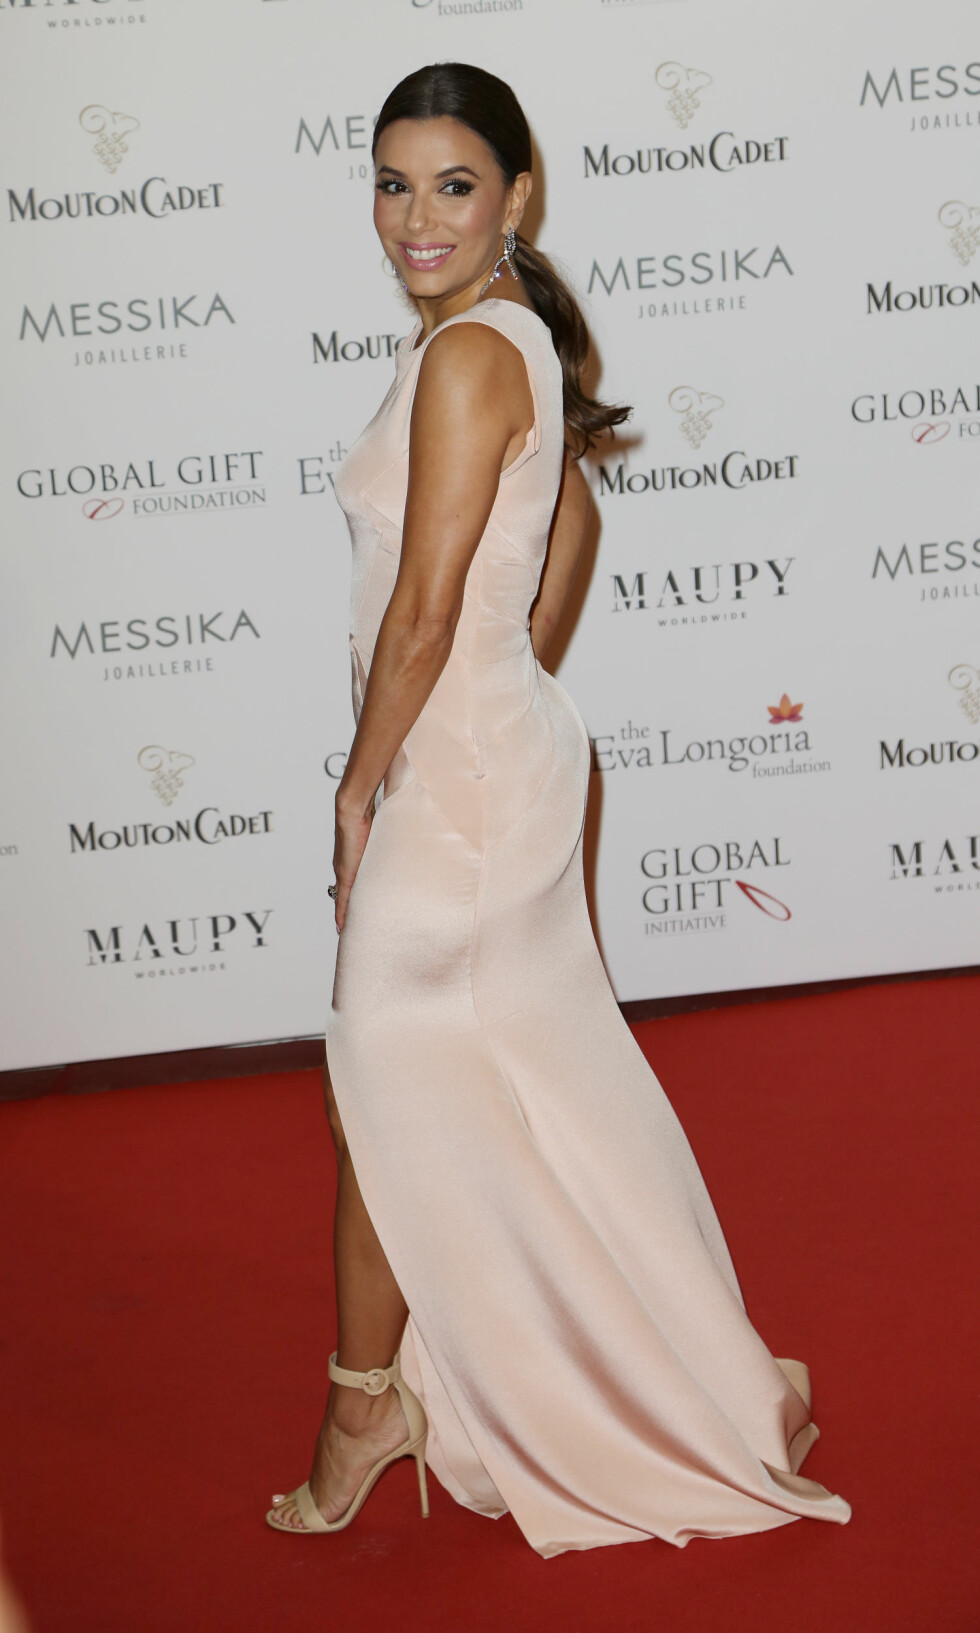 PUDDERFARGET: TV-stjernen Eva Longoria strålte i en pudderrosa kjole som vertinne for The Global Gift Gala i Cannes fredag 13. mai.  Foto: Abaca